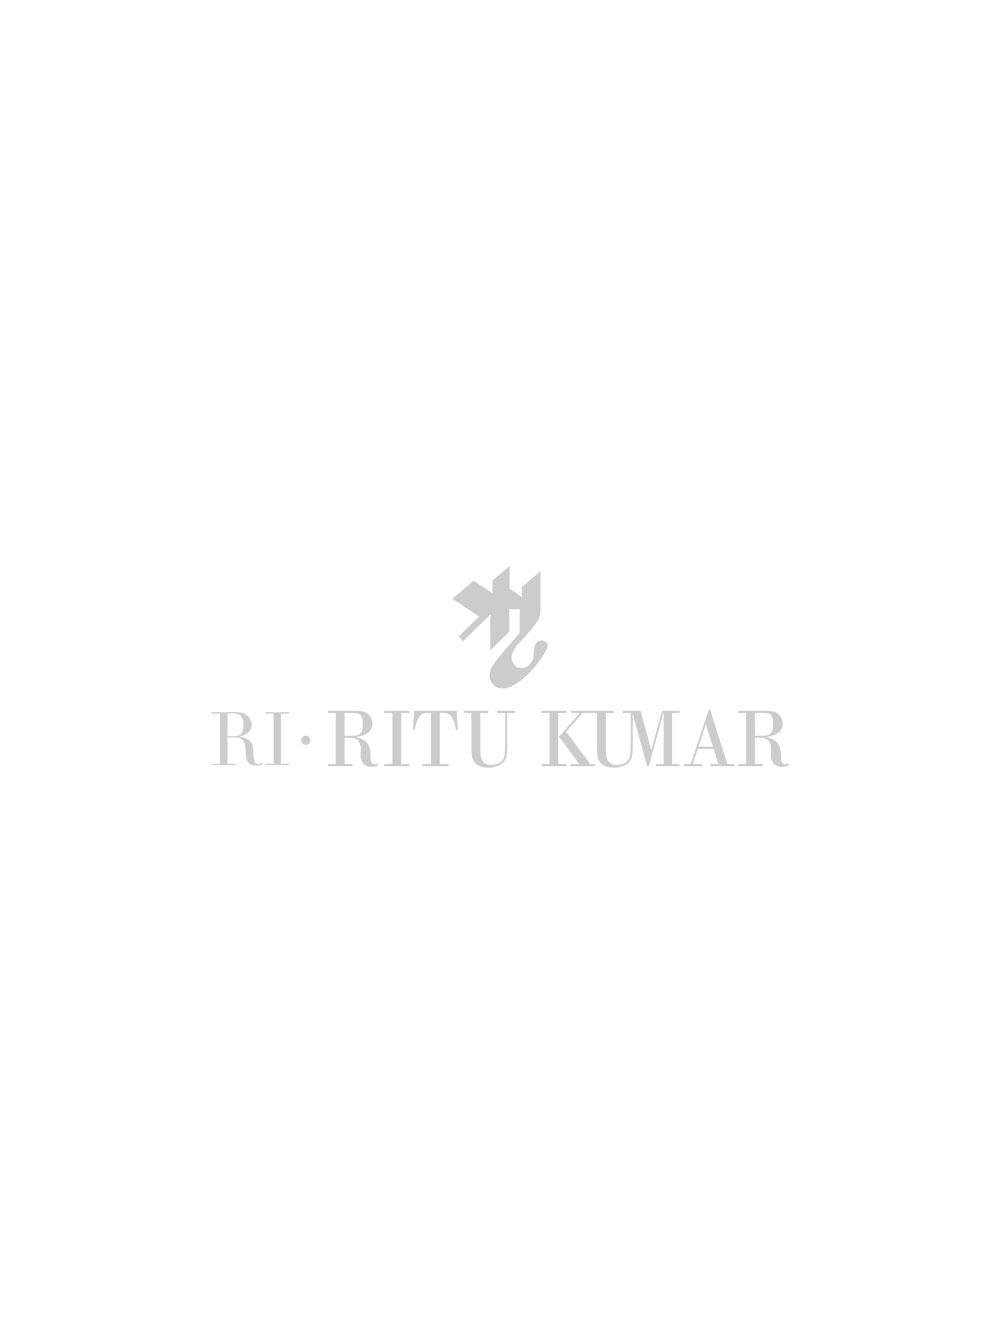 Coral & Khaki Embroidered Kurta With Skirt And Dupatta